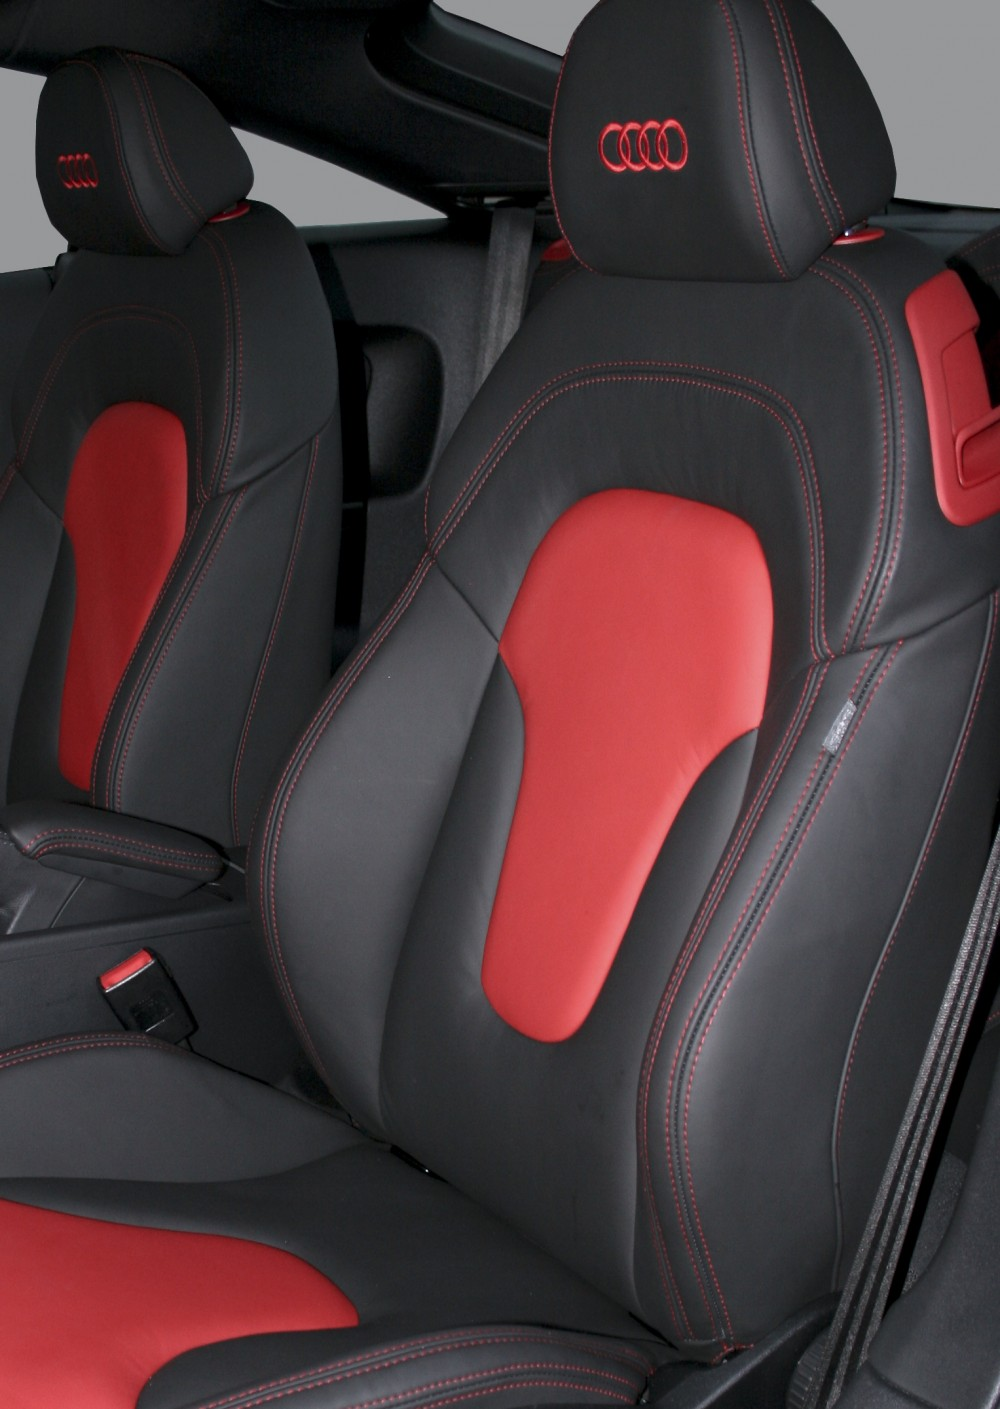 Picture of: Audi Tt Leather Seats Automotive Leather Specialists Trim Technik